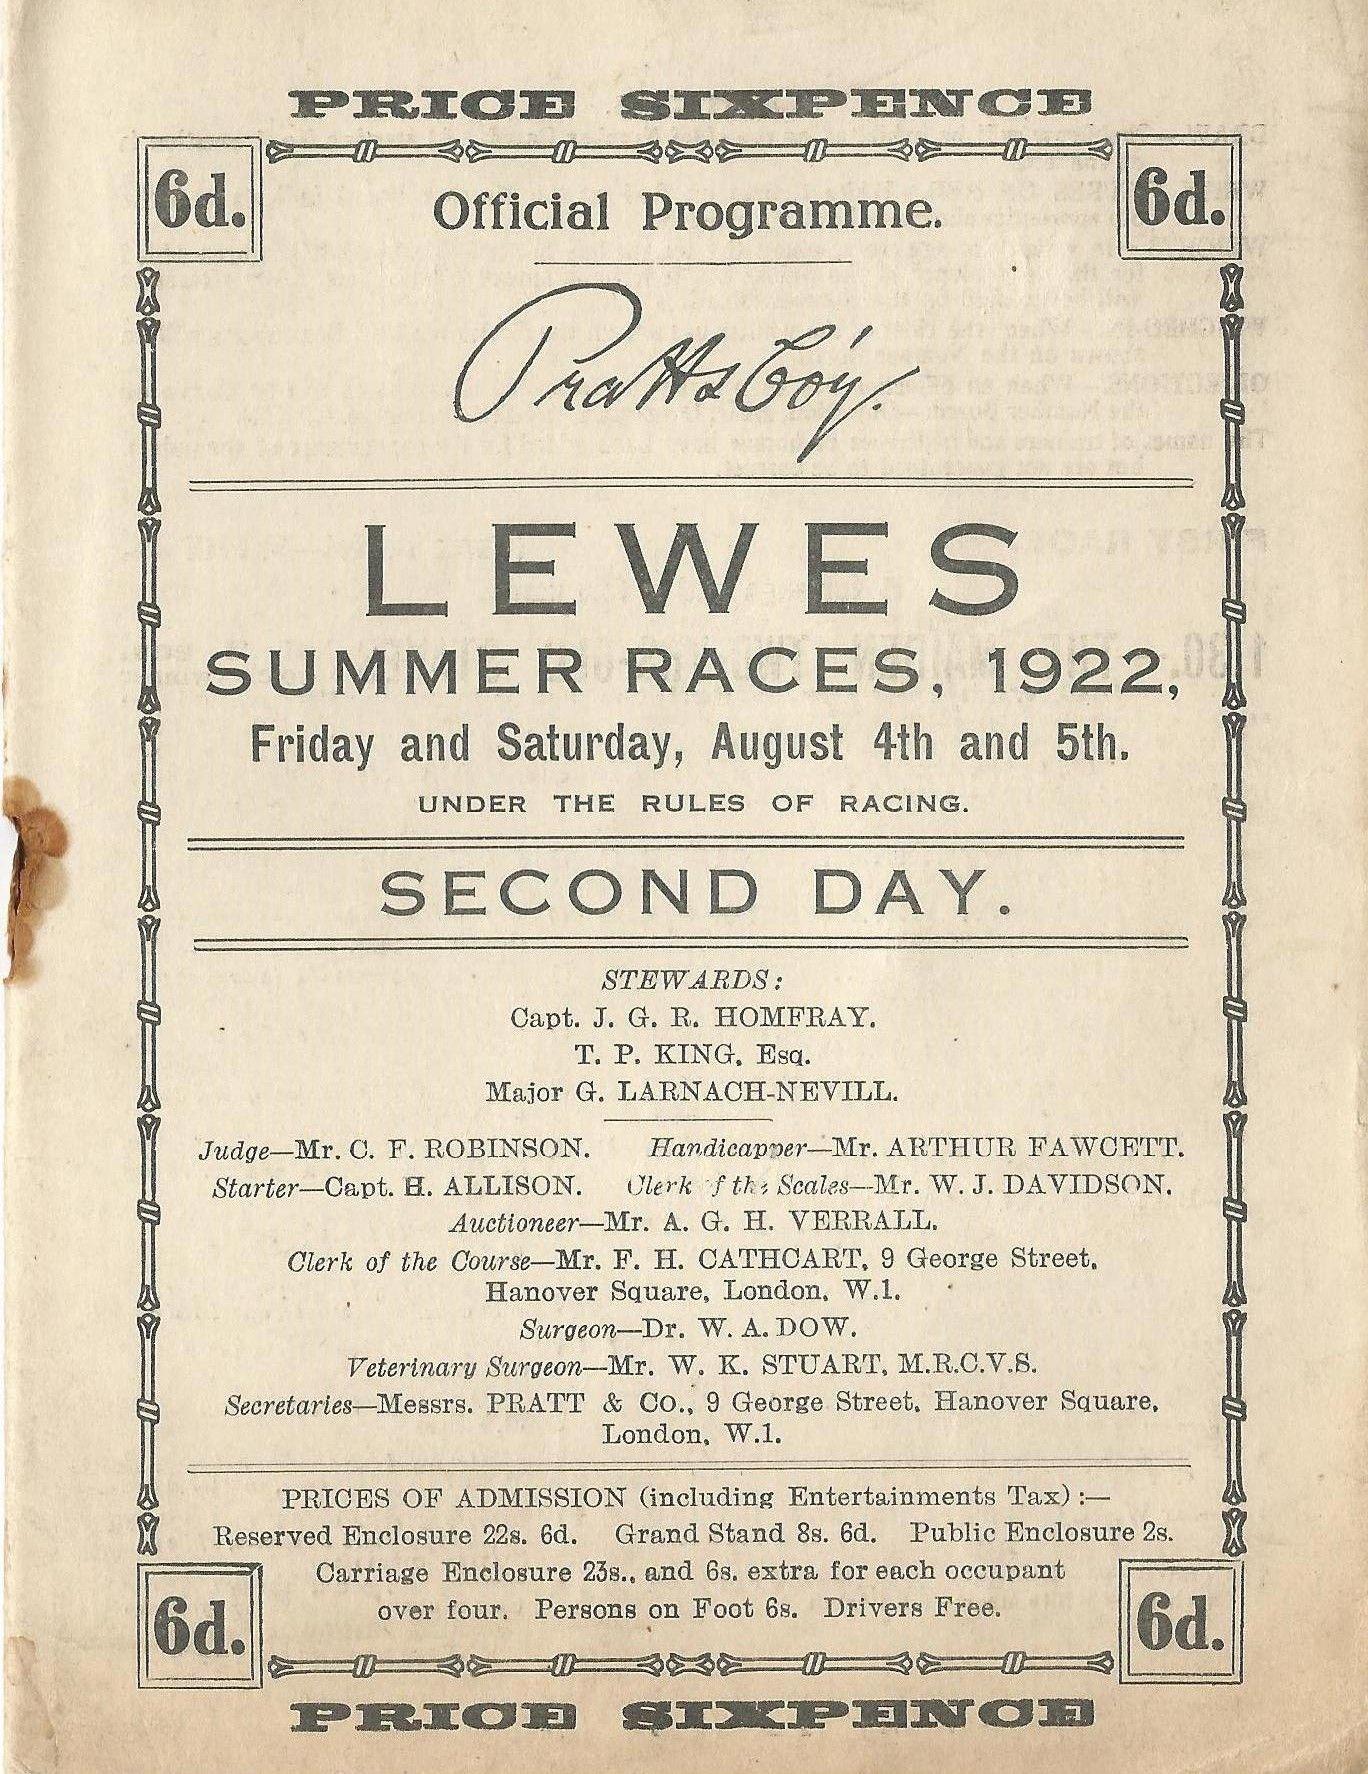 5-8-1922